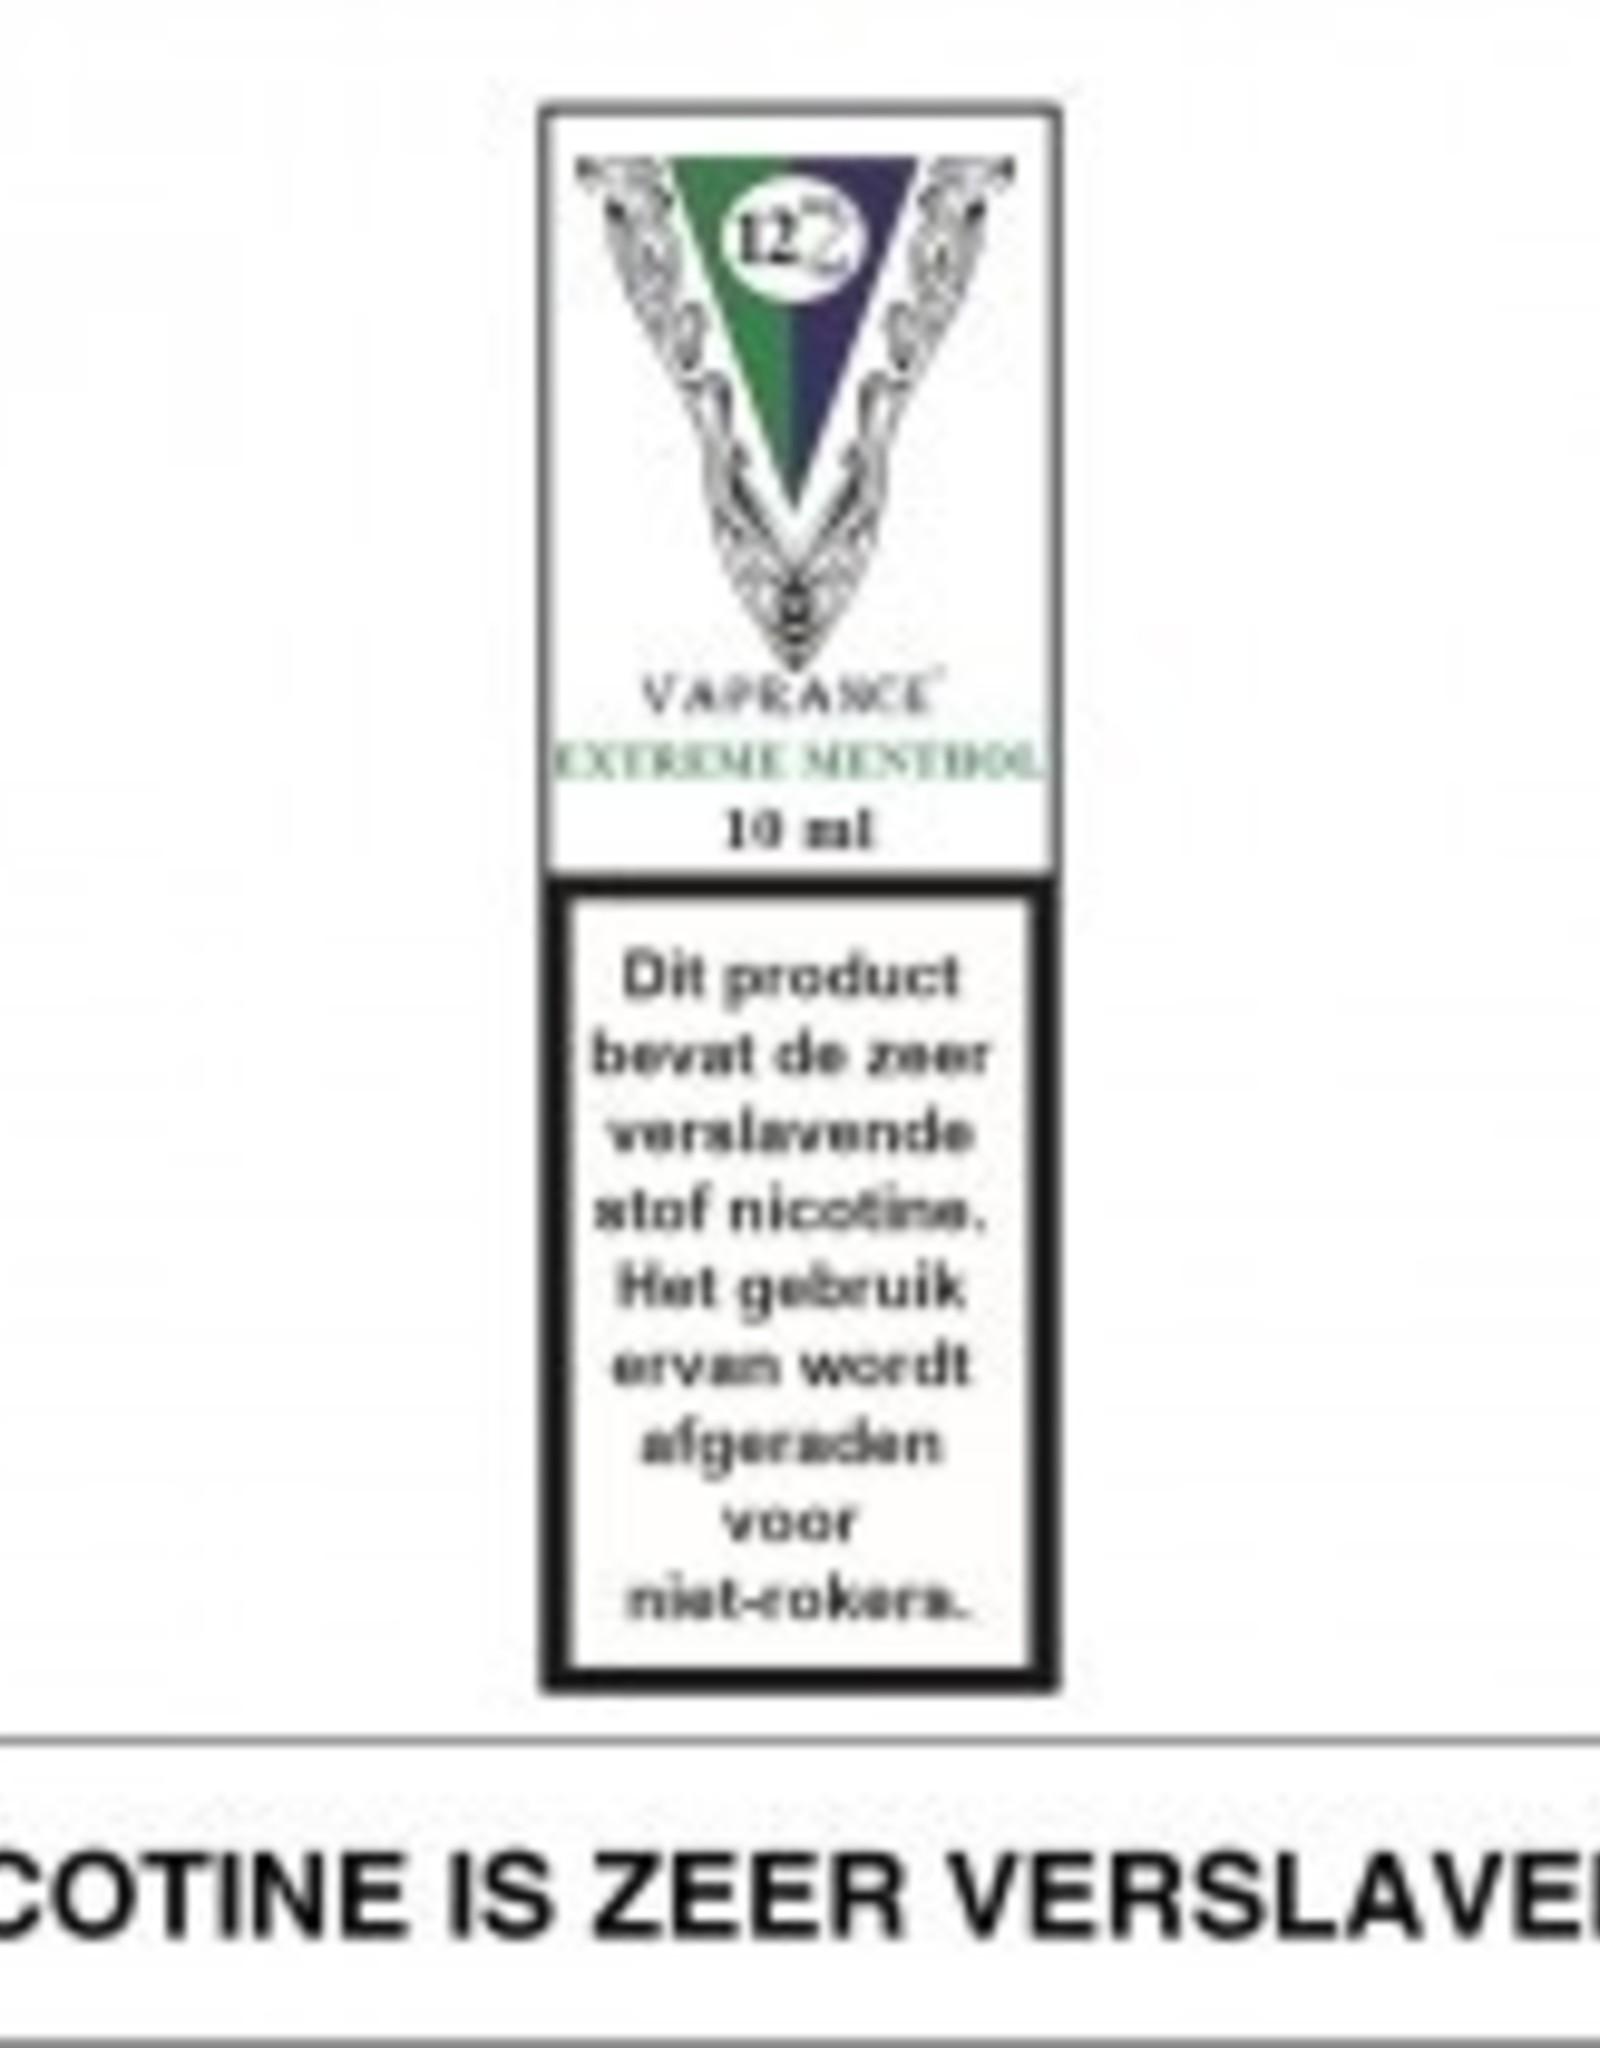 Vaprance Vaprance White Label Extreme Menthol 12 mg Nicotine